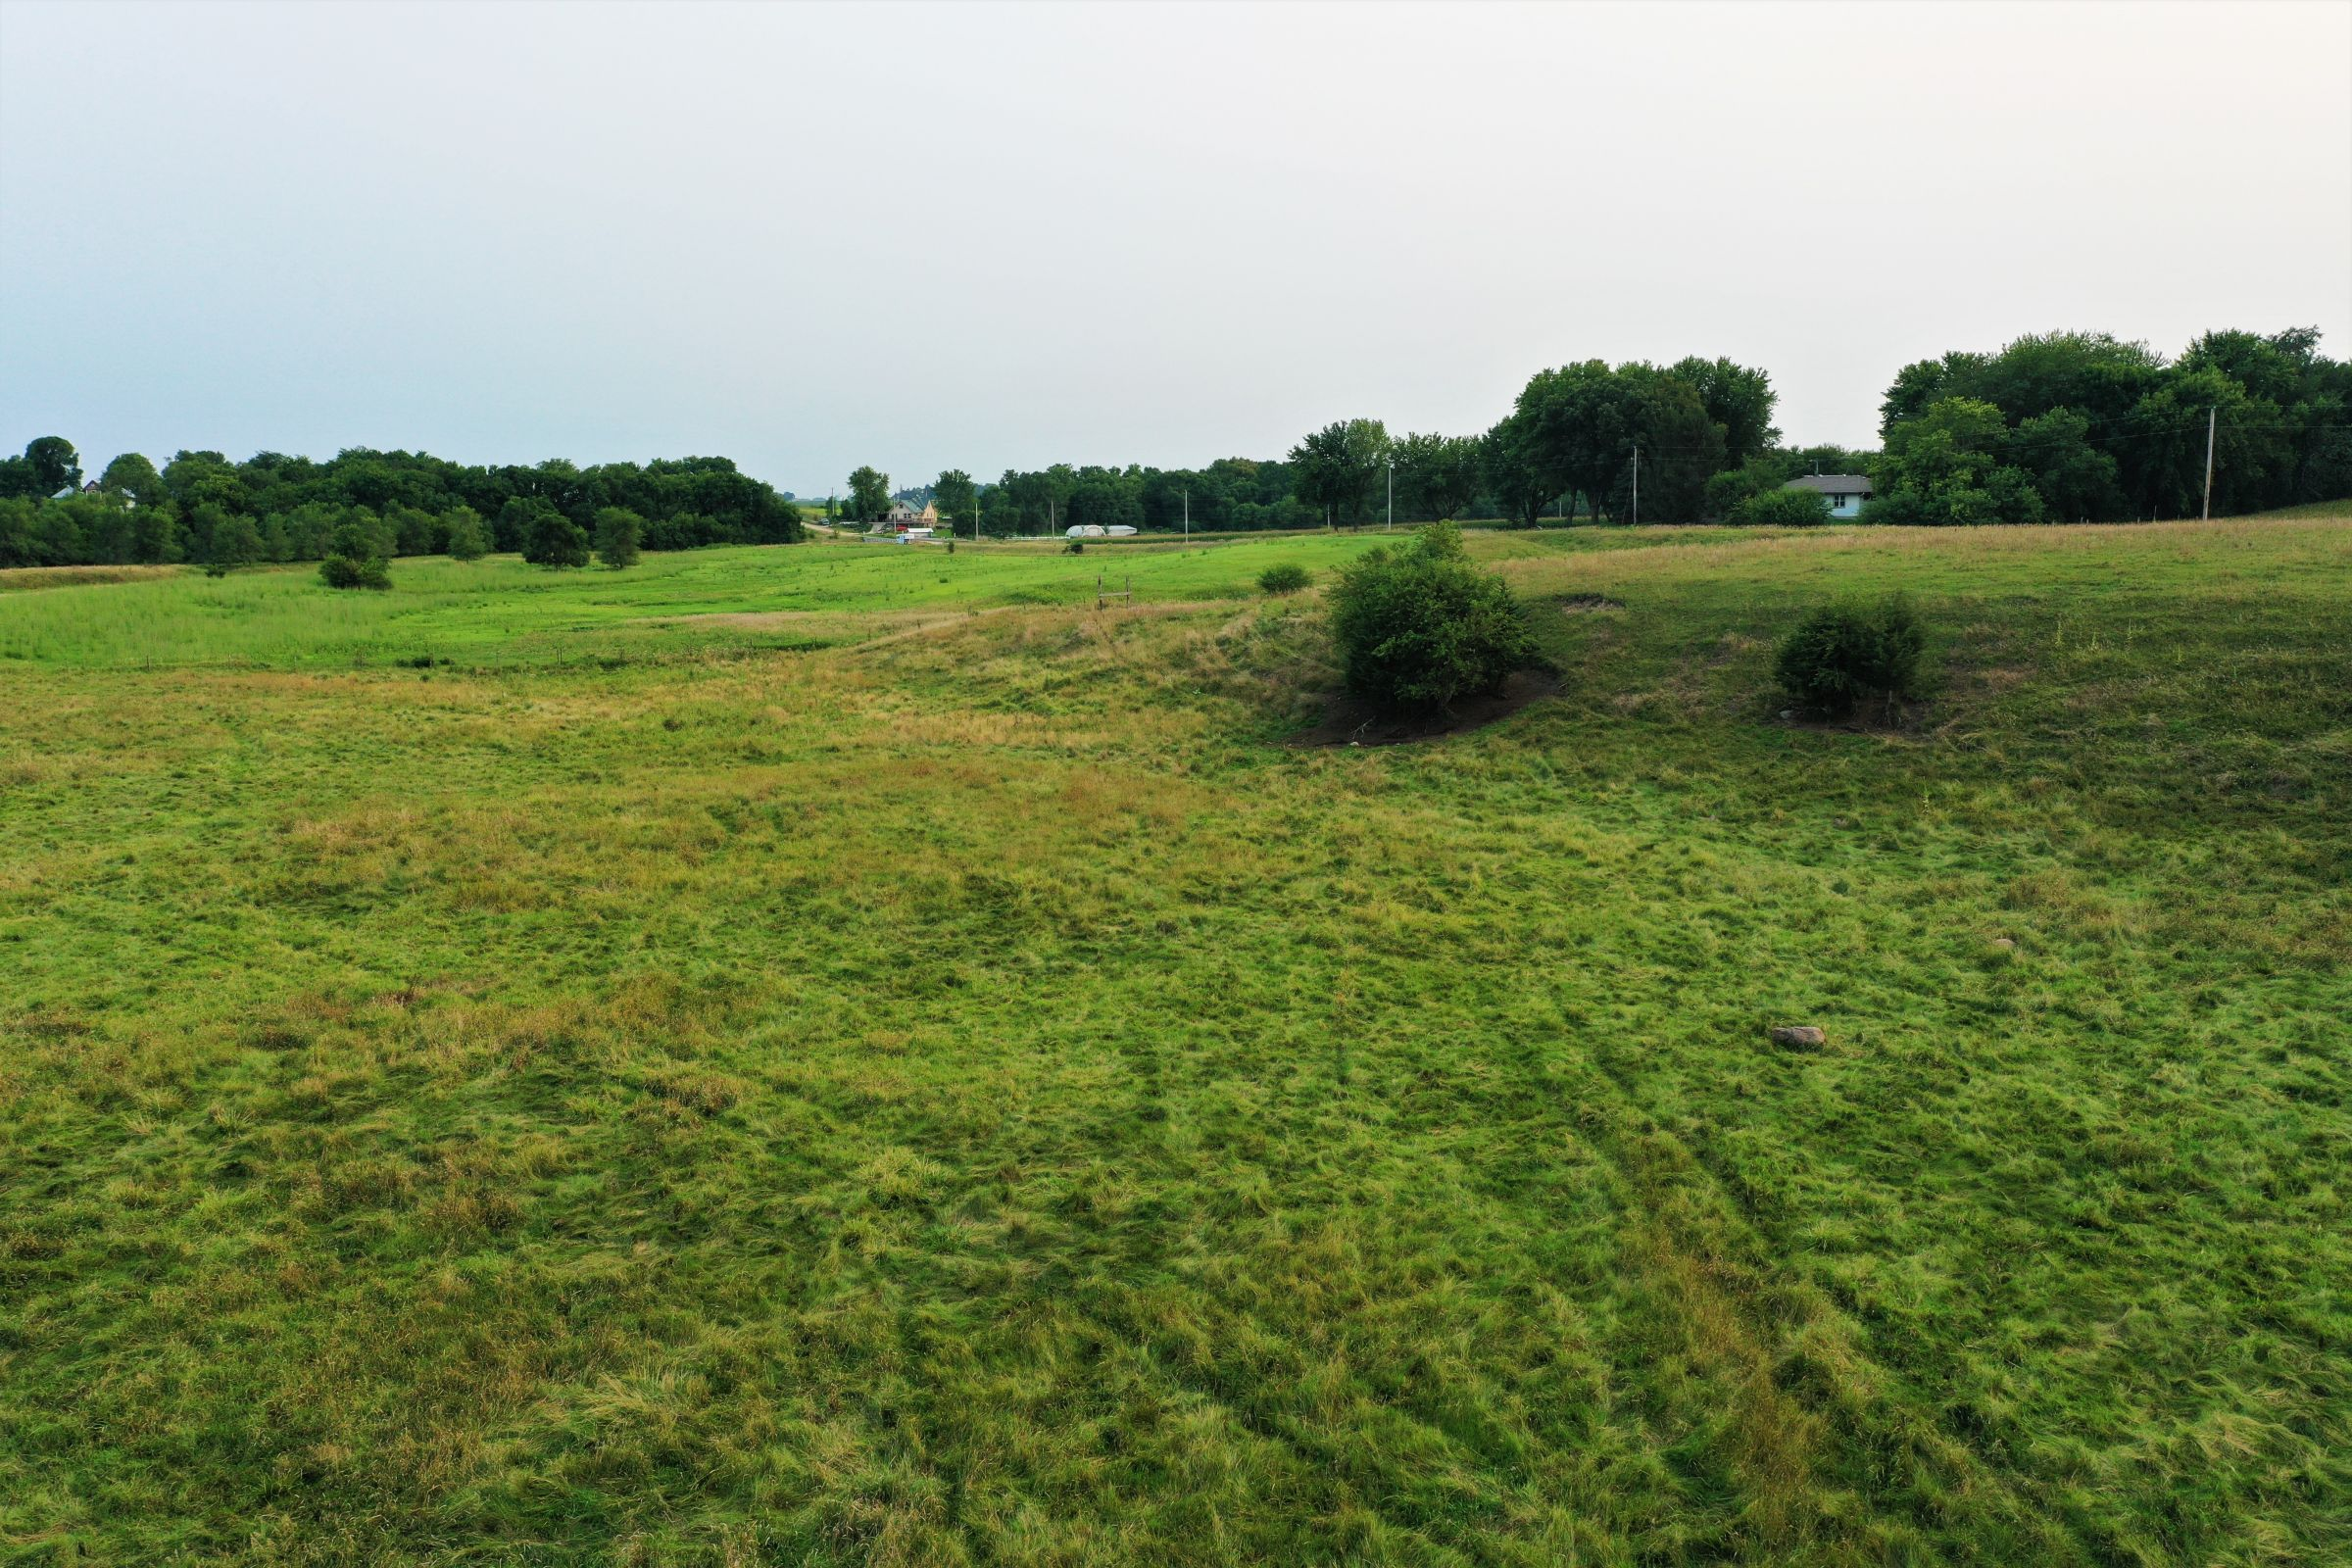 land-sac-county-iowa-23-acres-listing-number-15671-2-2021-08-11-170031.jpg